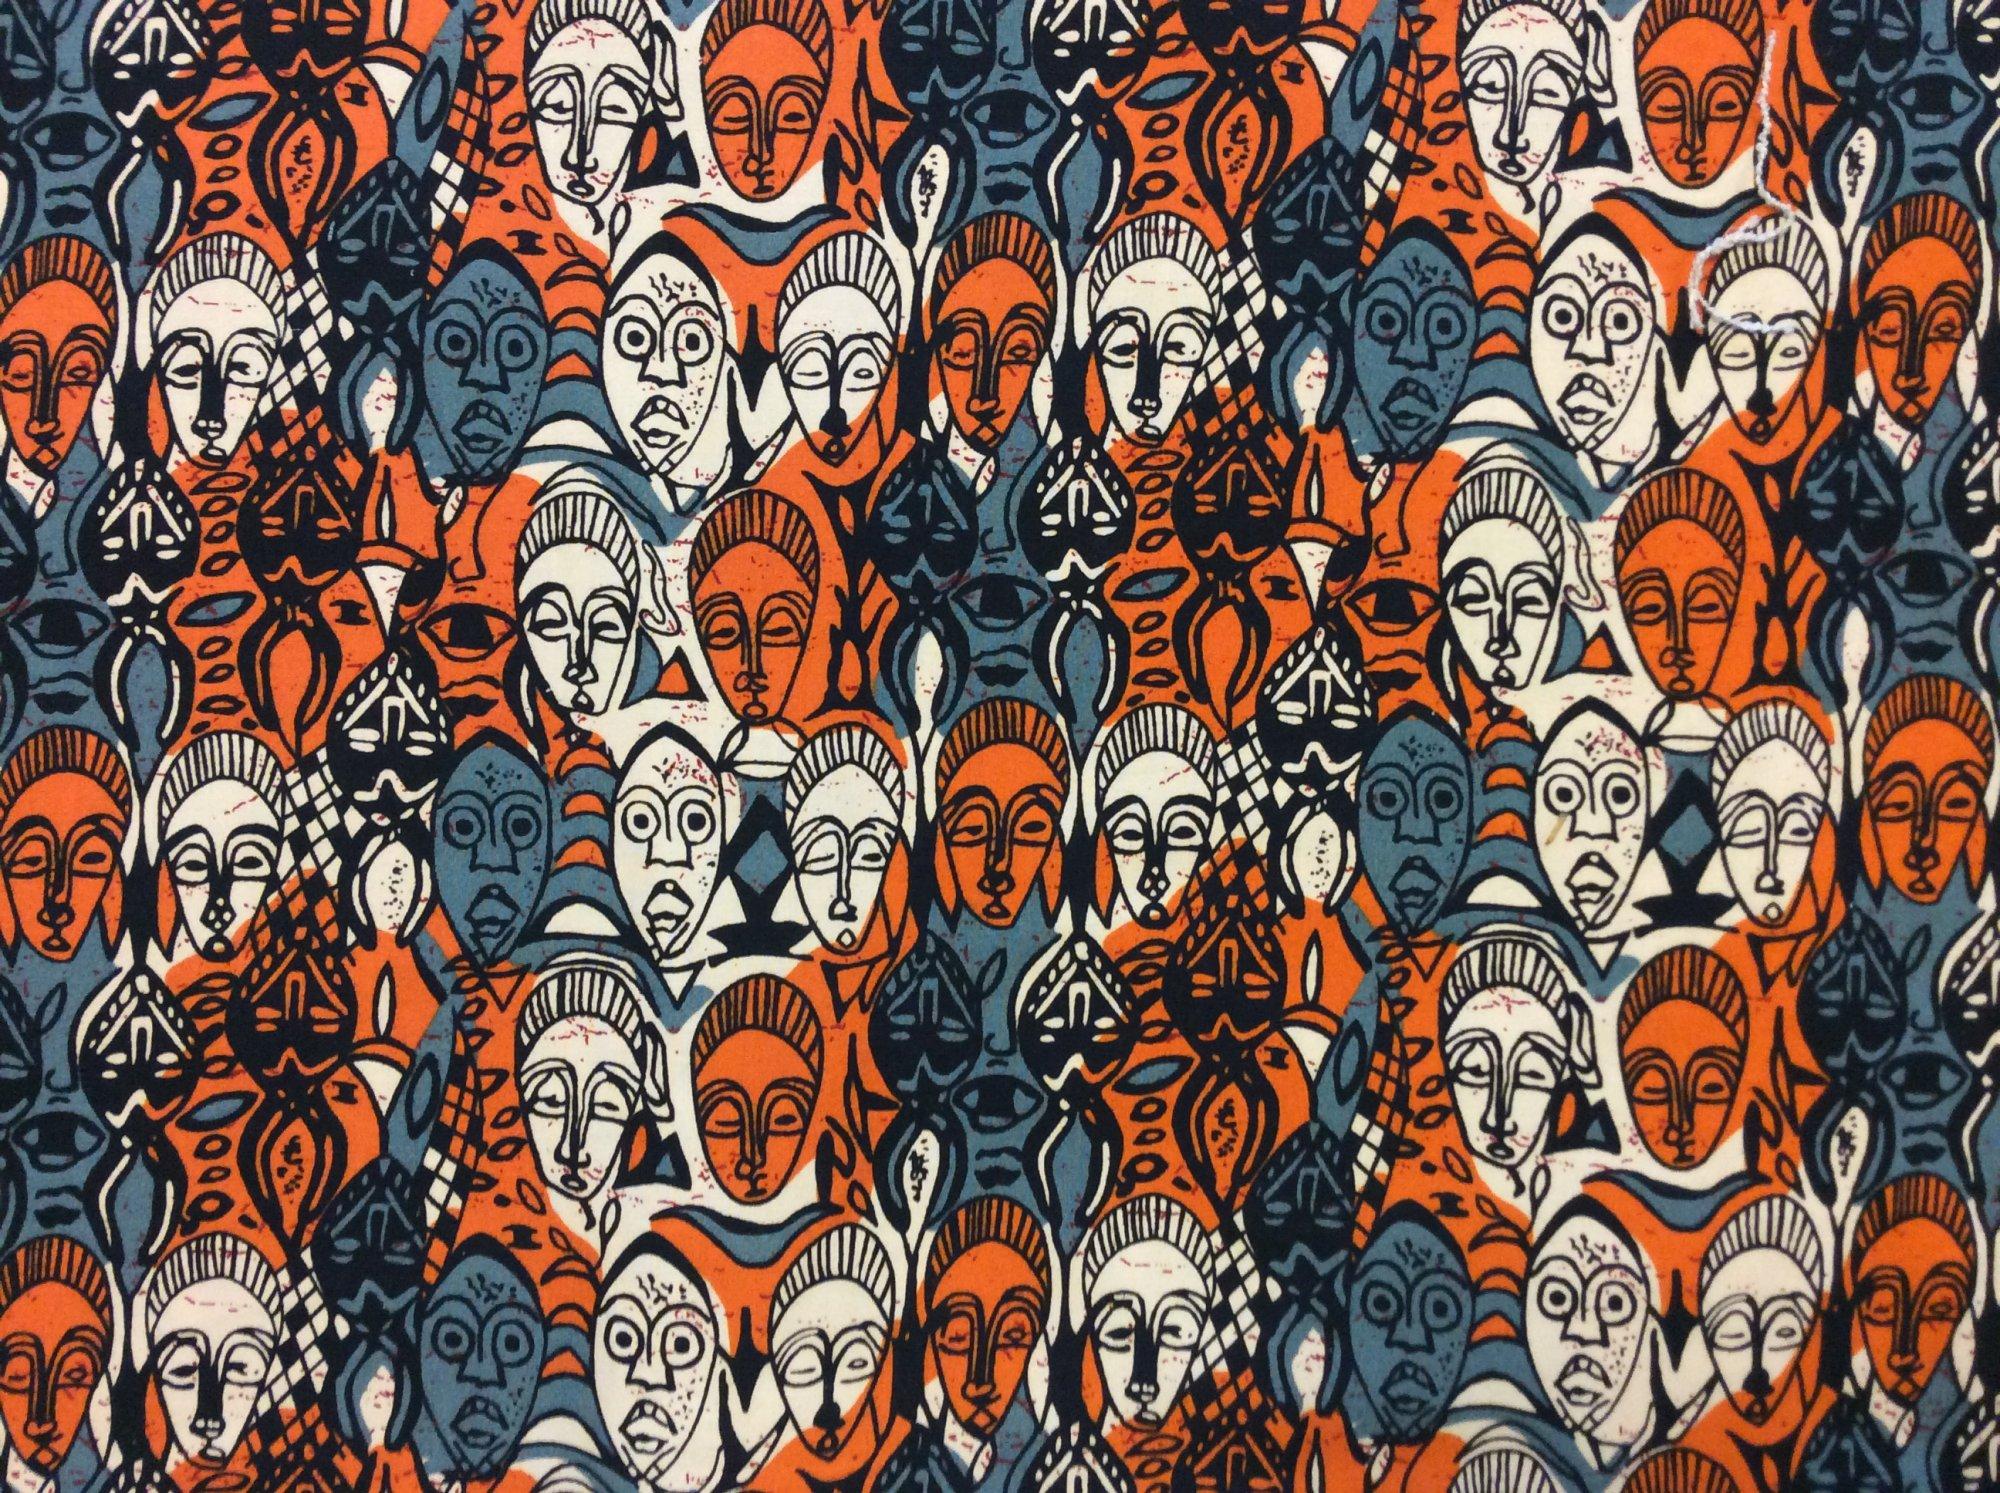 African Wax Cloth Lycra Stretch Blend Mask Orange and Gray Apparel Fabric JG080